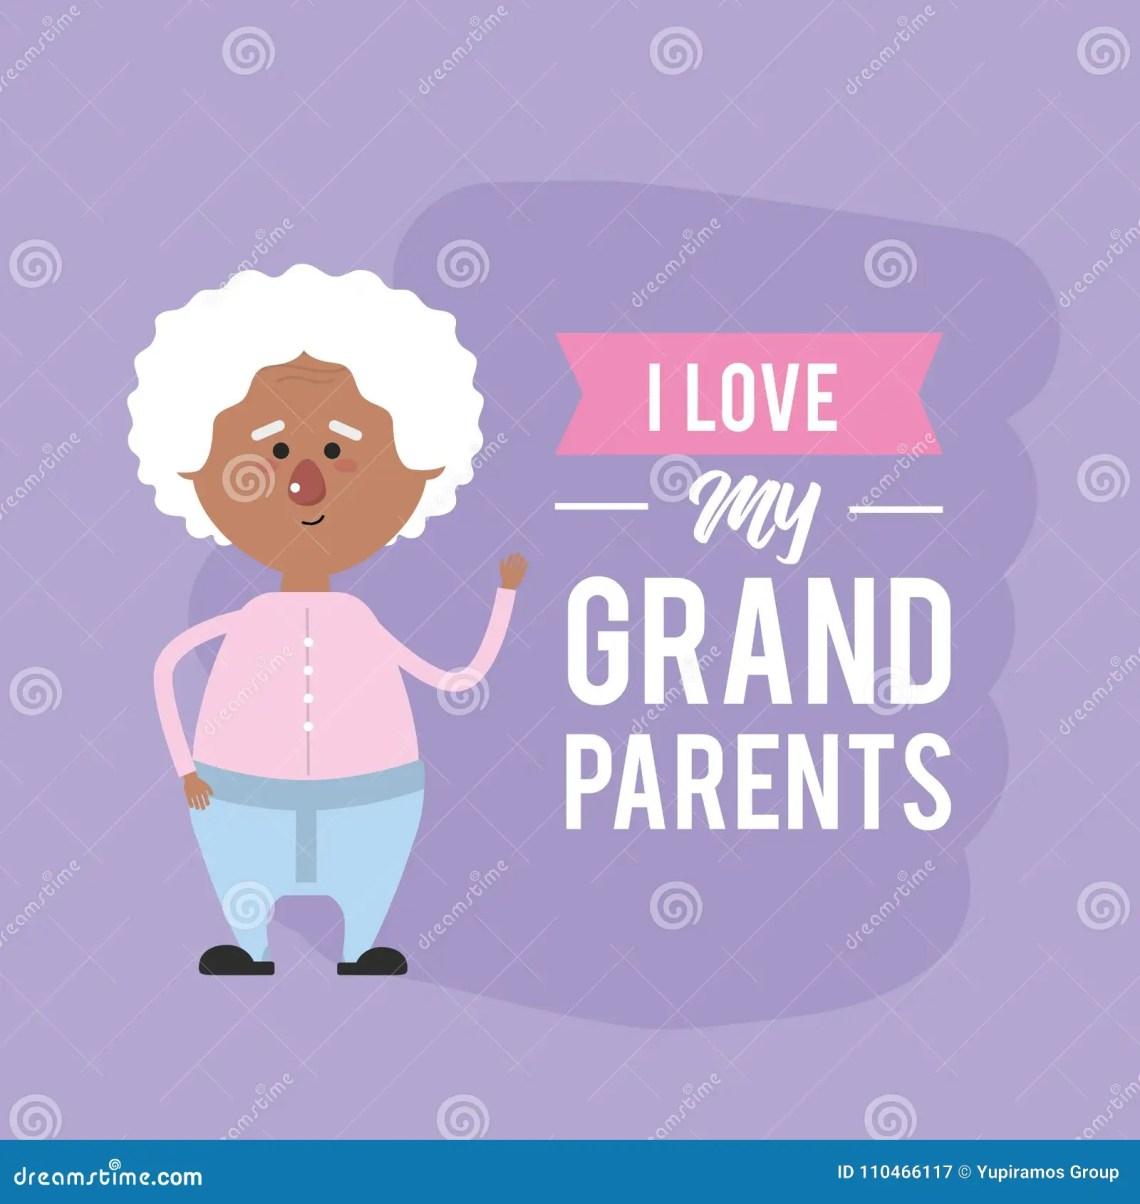 Download Love My Grandkids Svg - Layered SVG Cut File